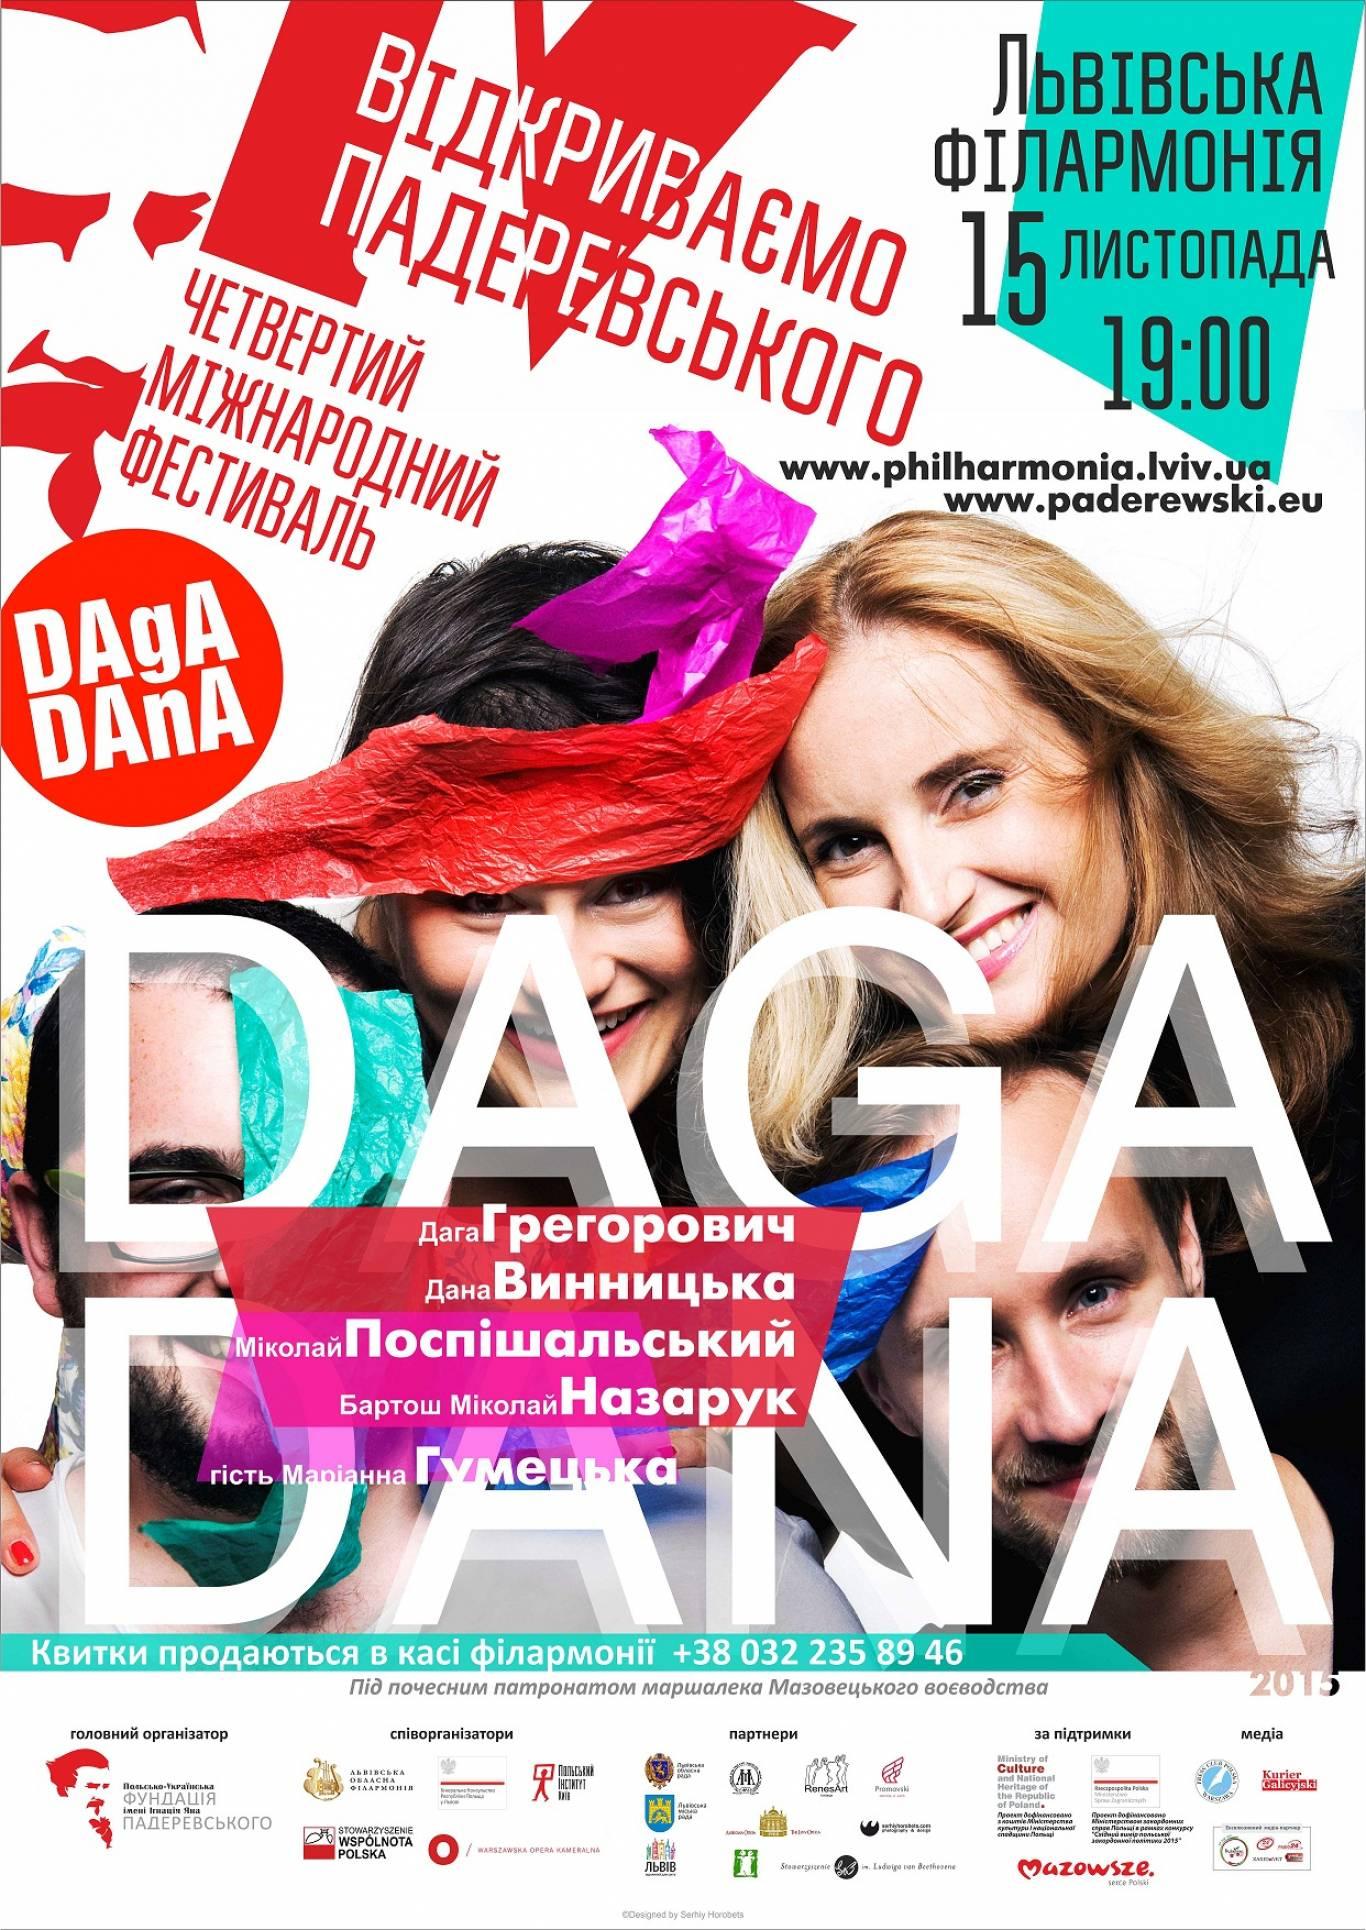 Джаз від польсько-українського гурту DAGADANA